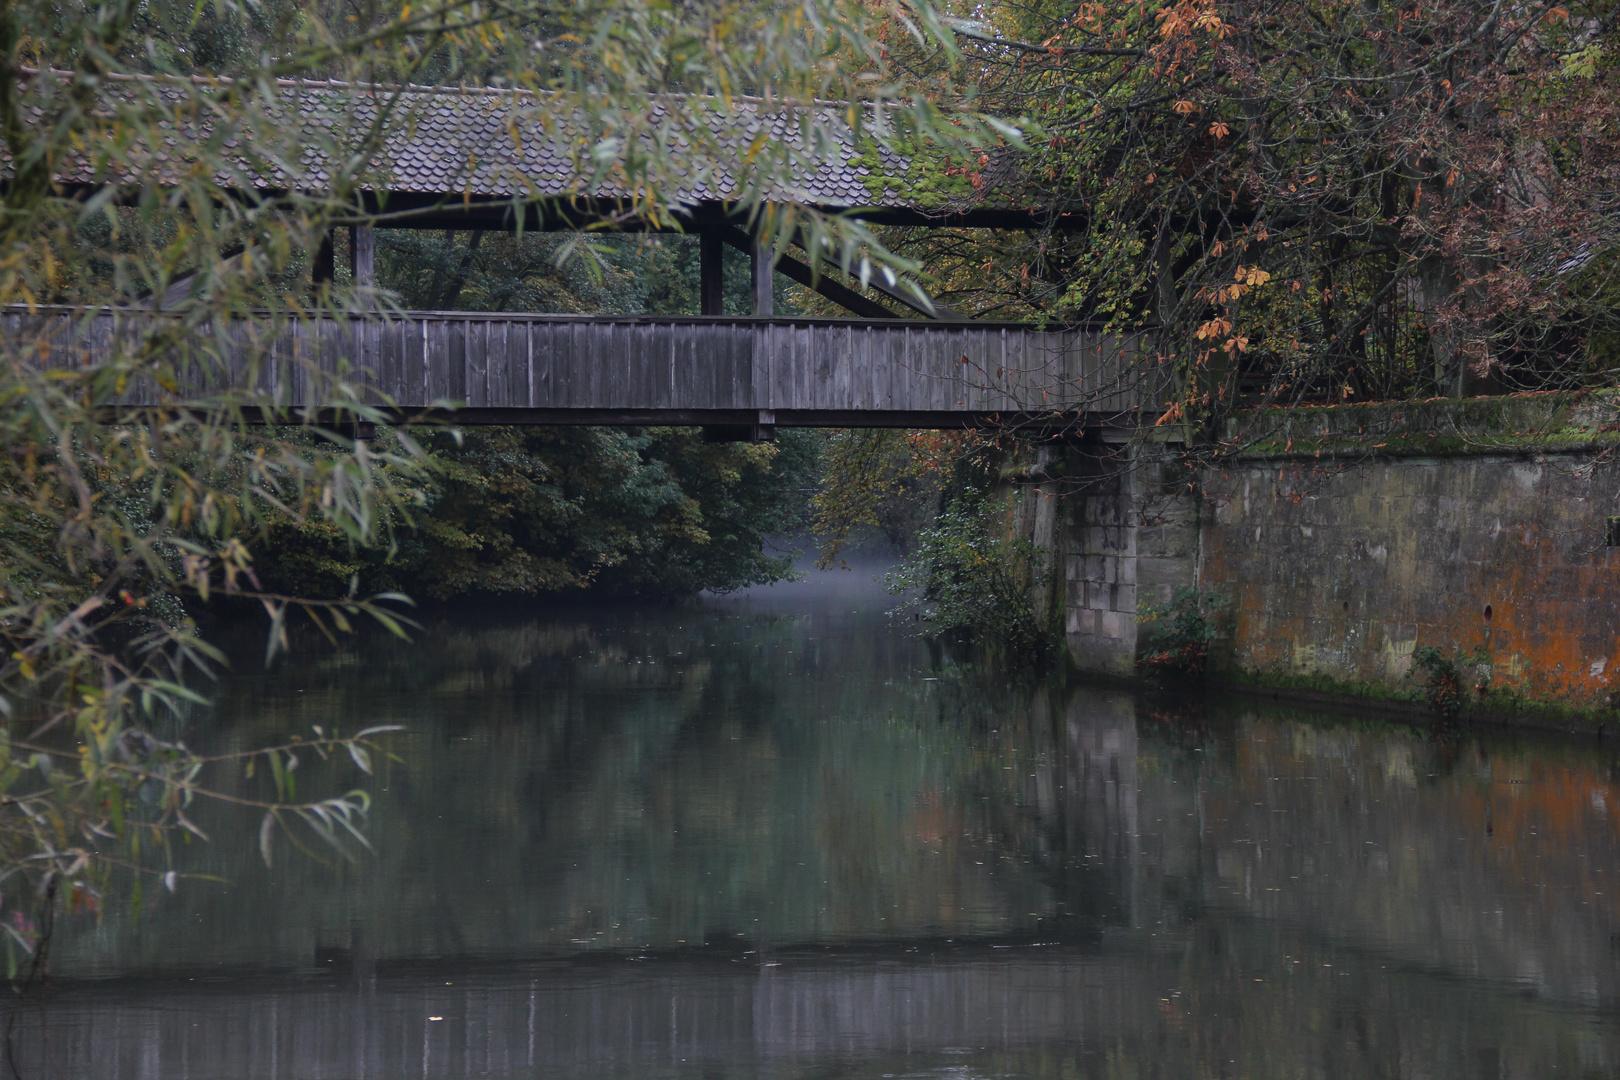 Lauf an der Pegnitz, Pegnitz, Brücke